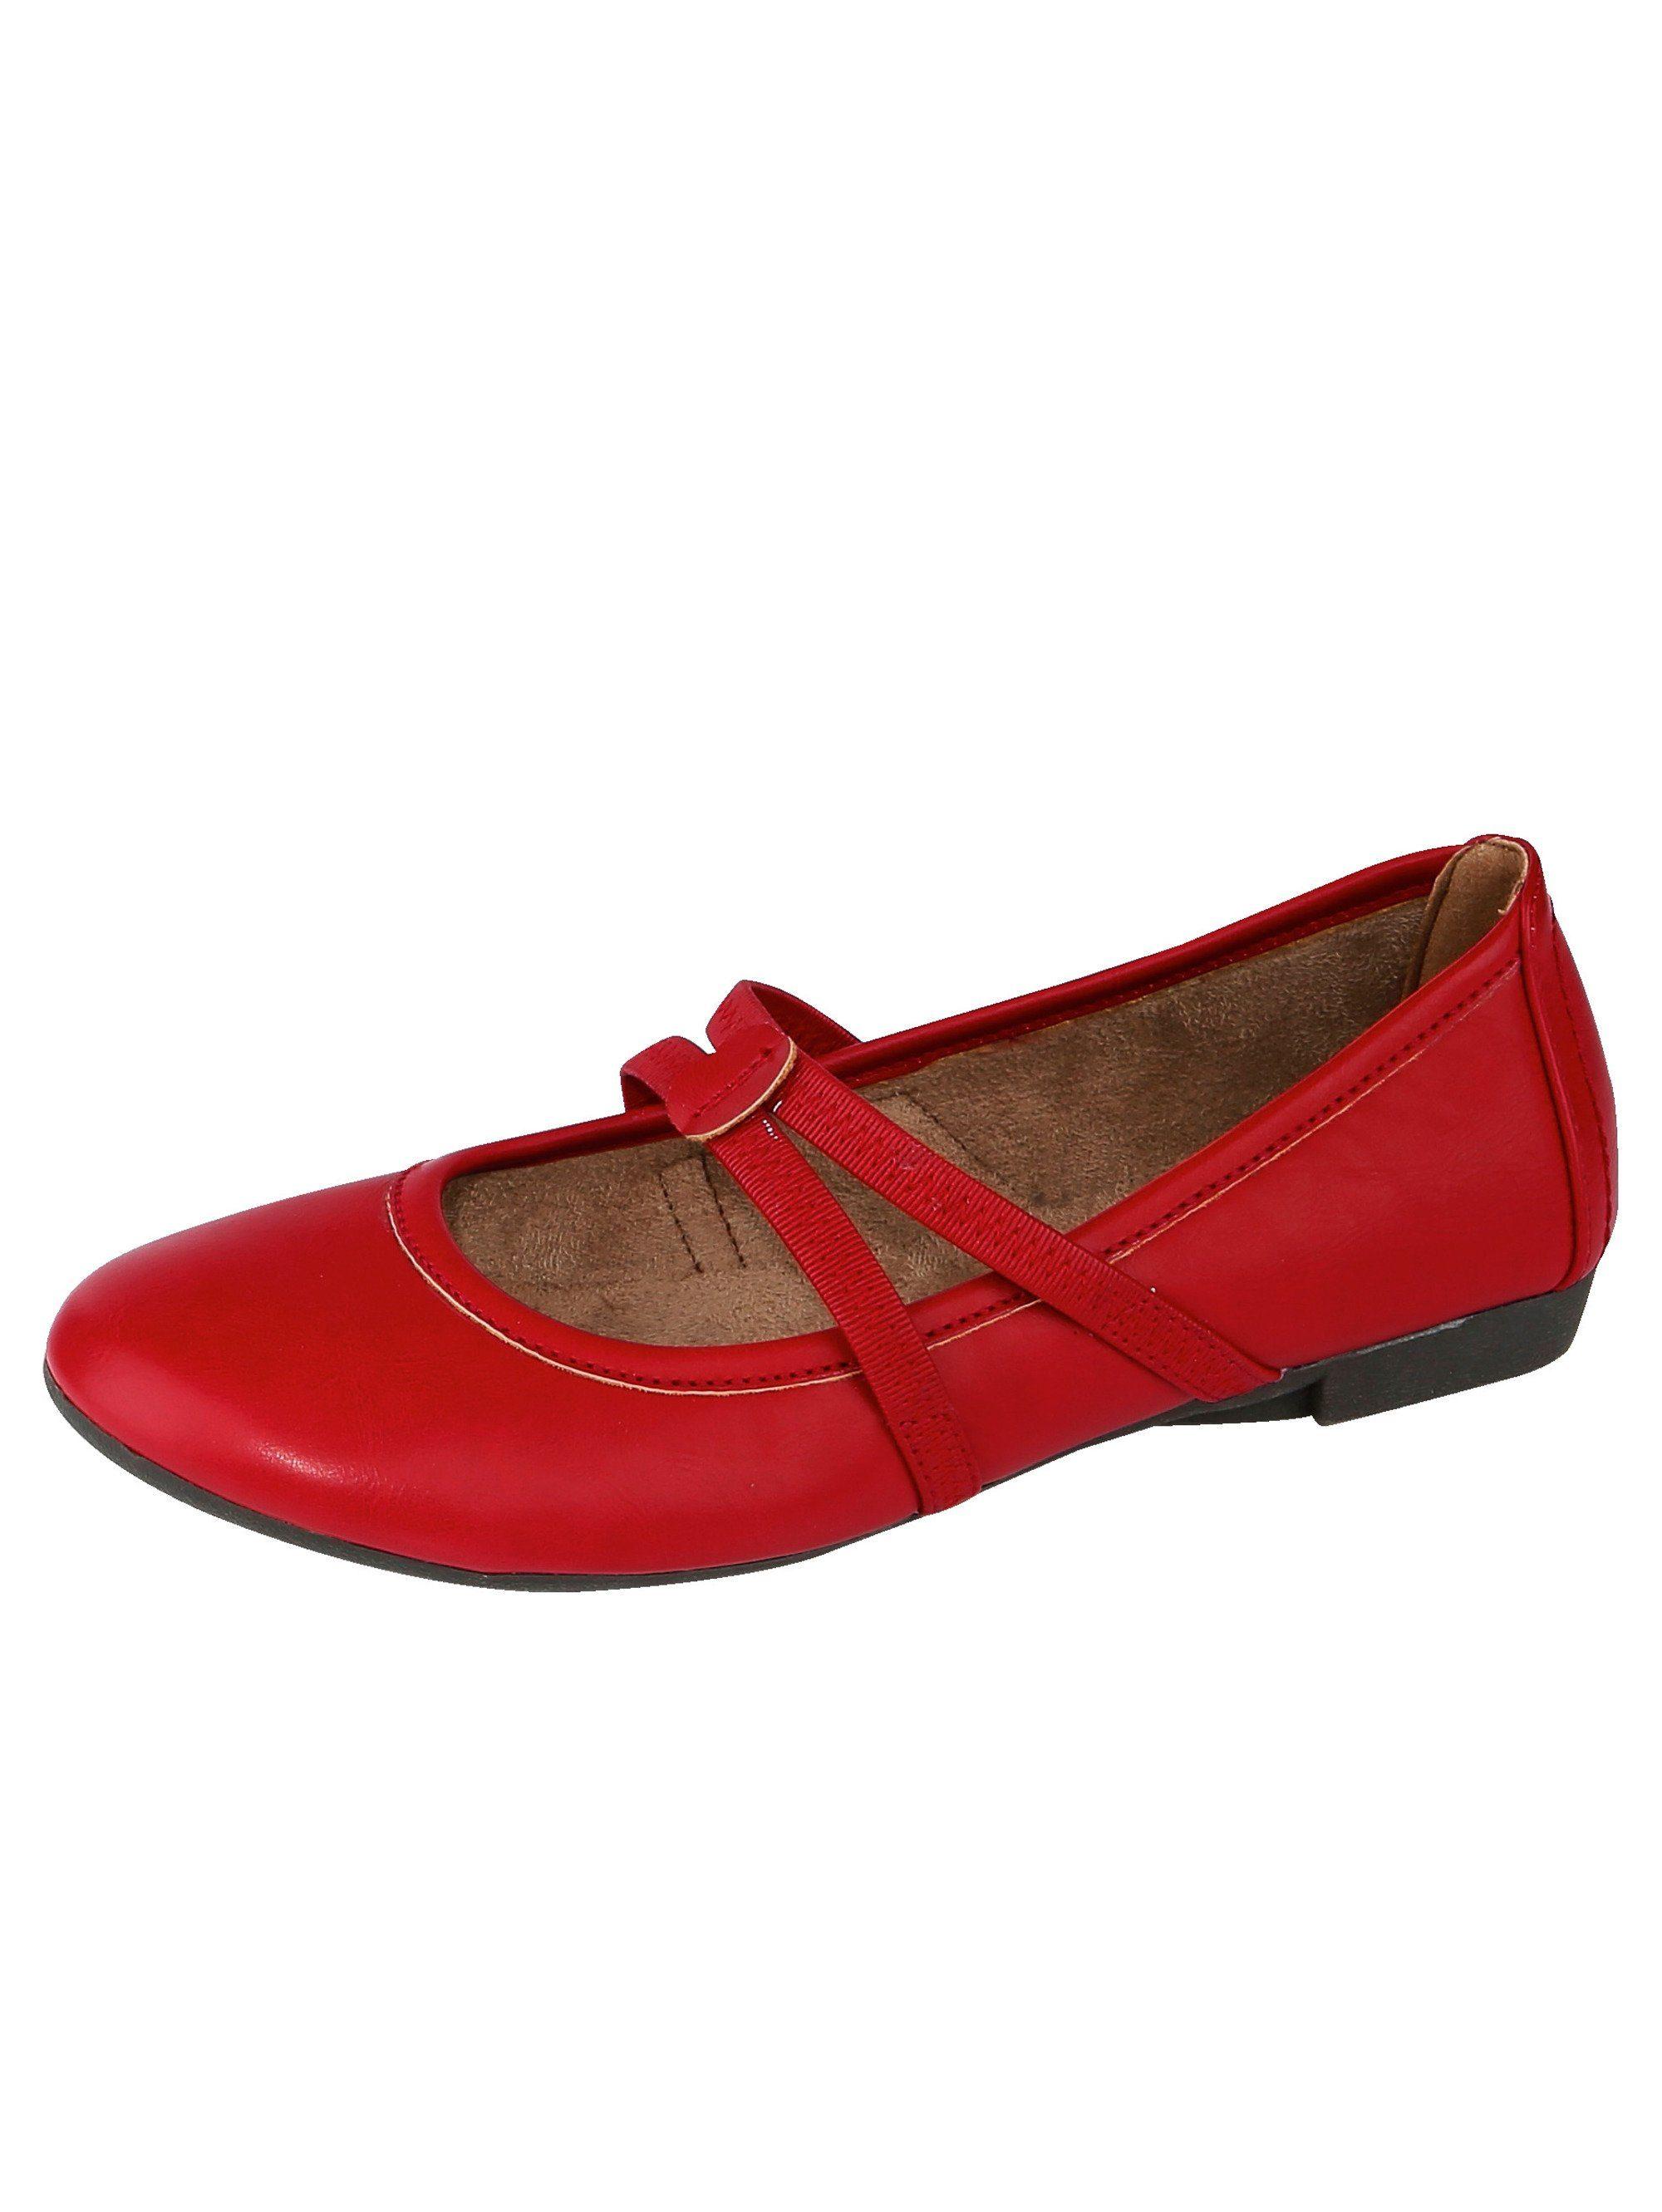 Liva Loop Ballerina mit elastischen Riemchen  rot